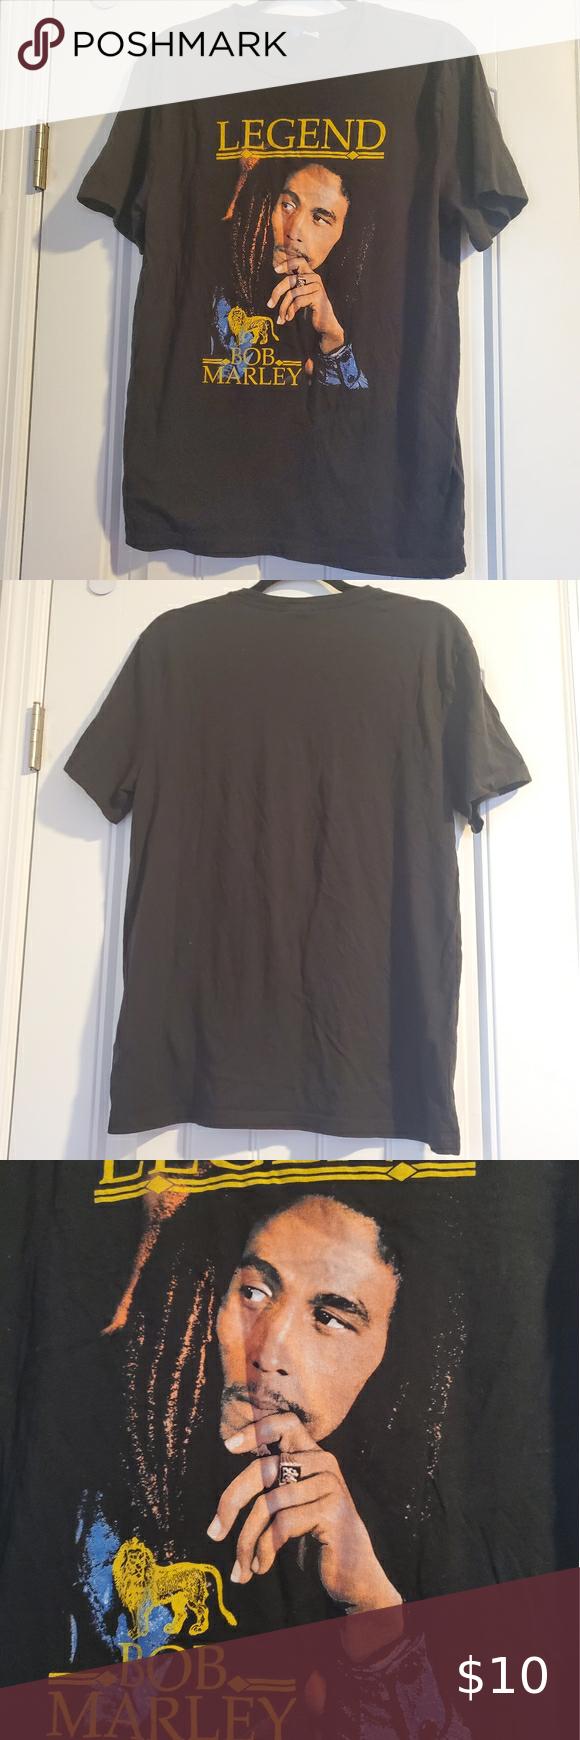 Bob Marley Tshirt In 2020 T Shirt Marley Bob Marley